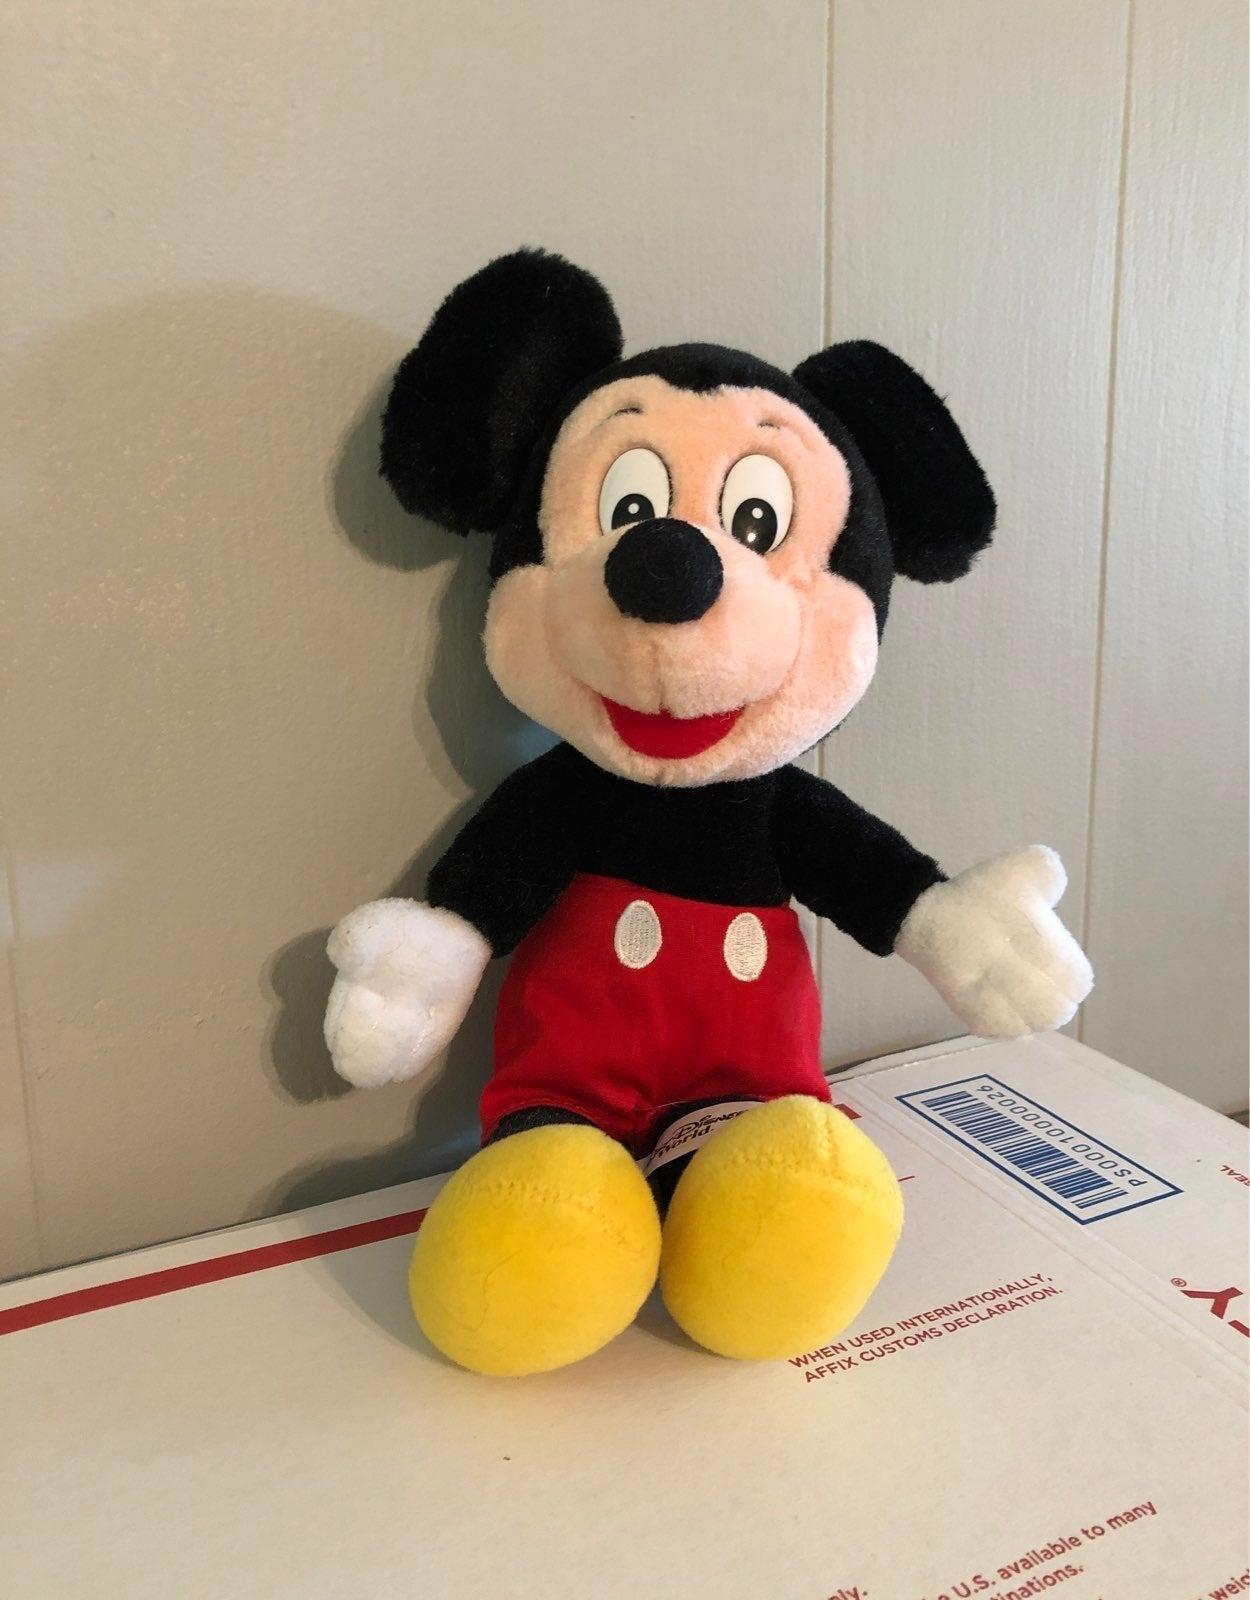 Vintage Mickey Mouse Plush Stuffed